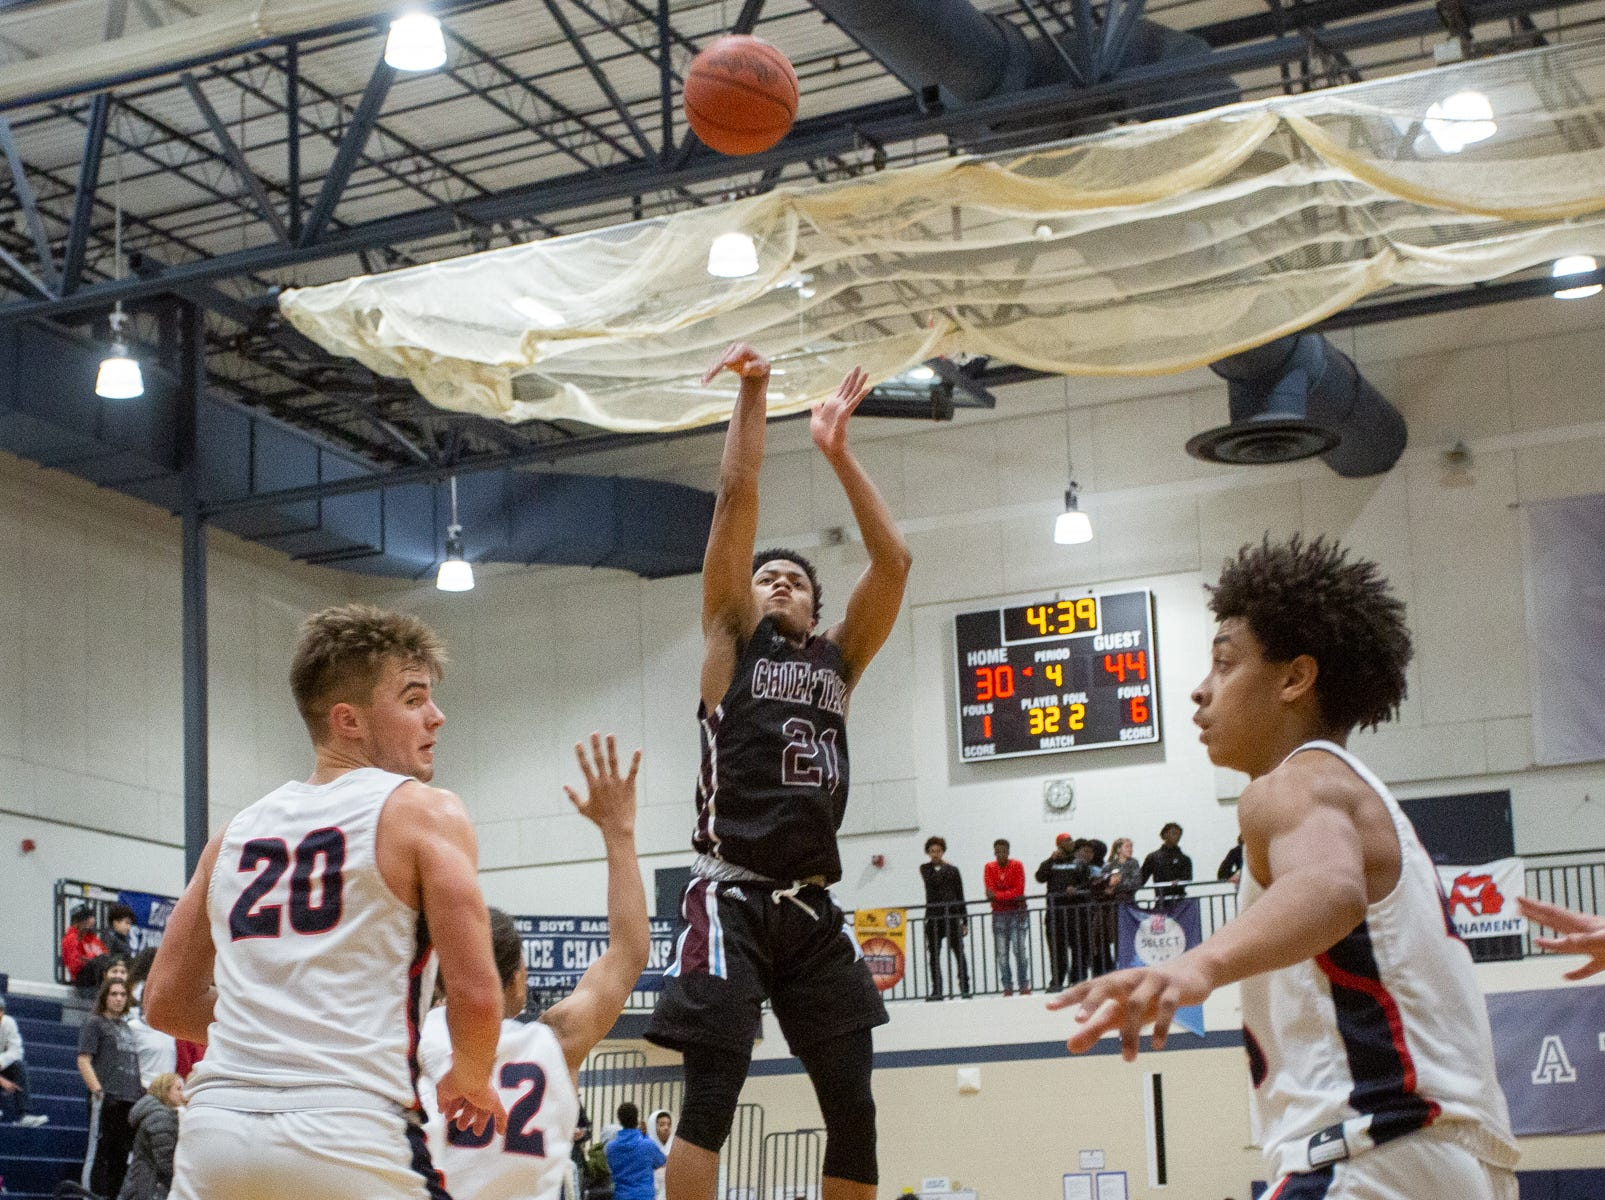 Okemos junior Noah Pruitt shoots against East Lansing on Tuesday, Jan. 8, 2019 at East Lansing High School.